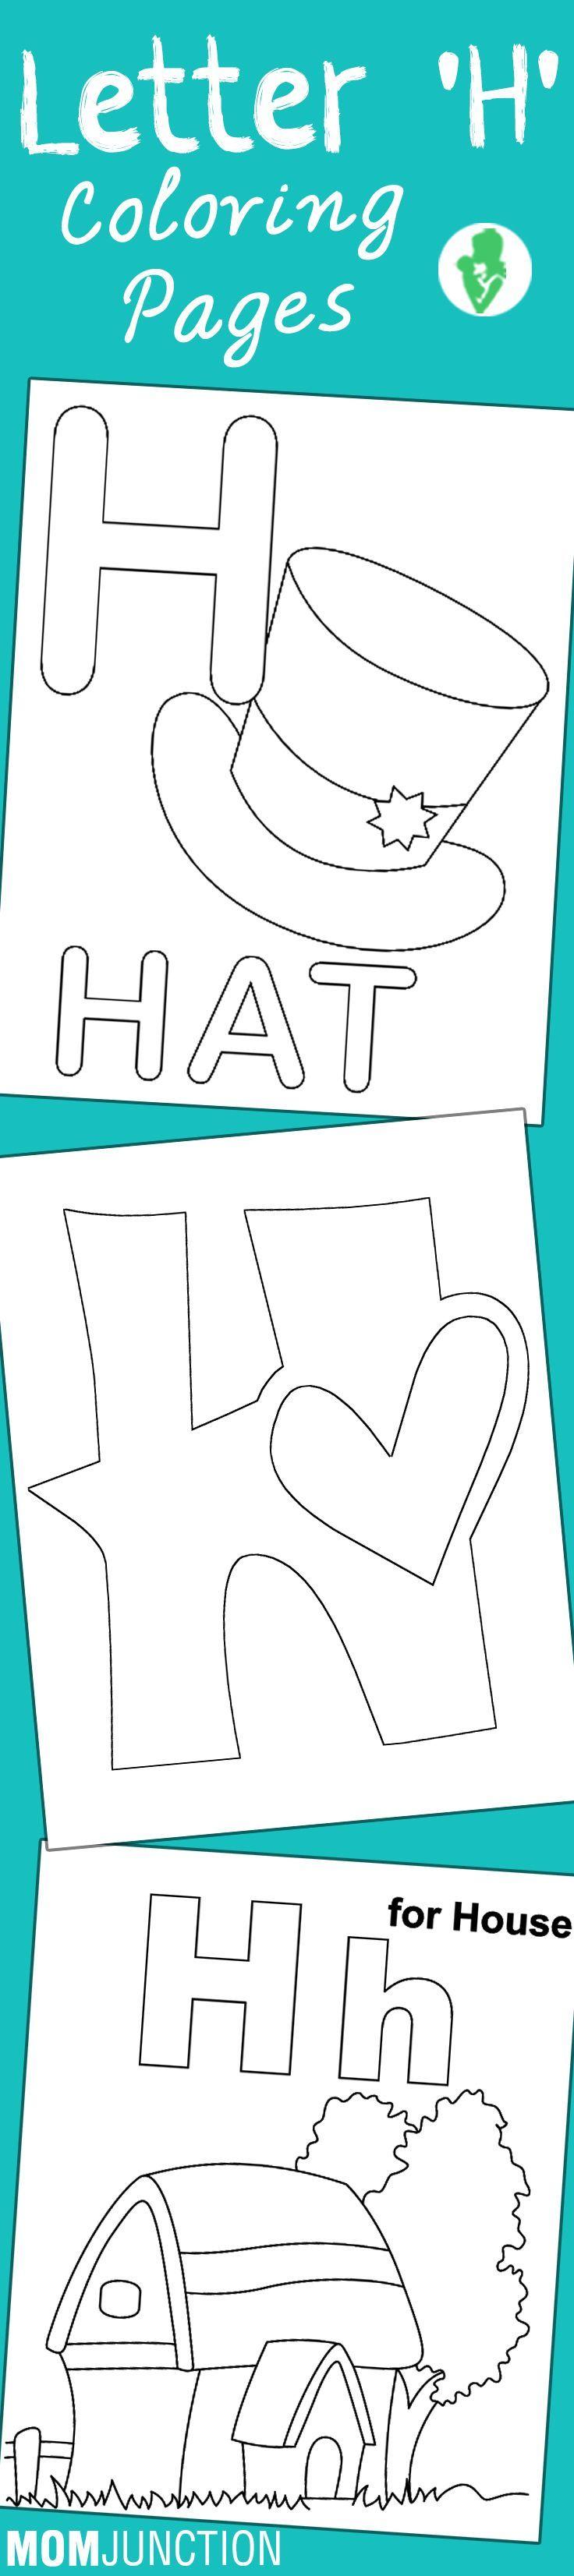 Top 25 free printable letter h coloring pages online worksheet pinterest preschool lettering and preschool letters